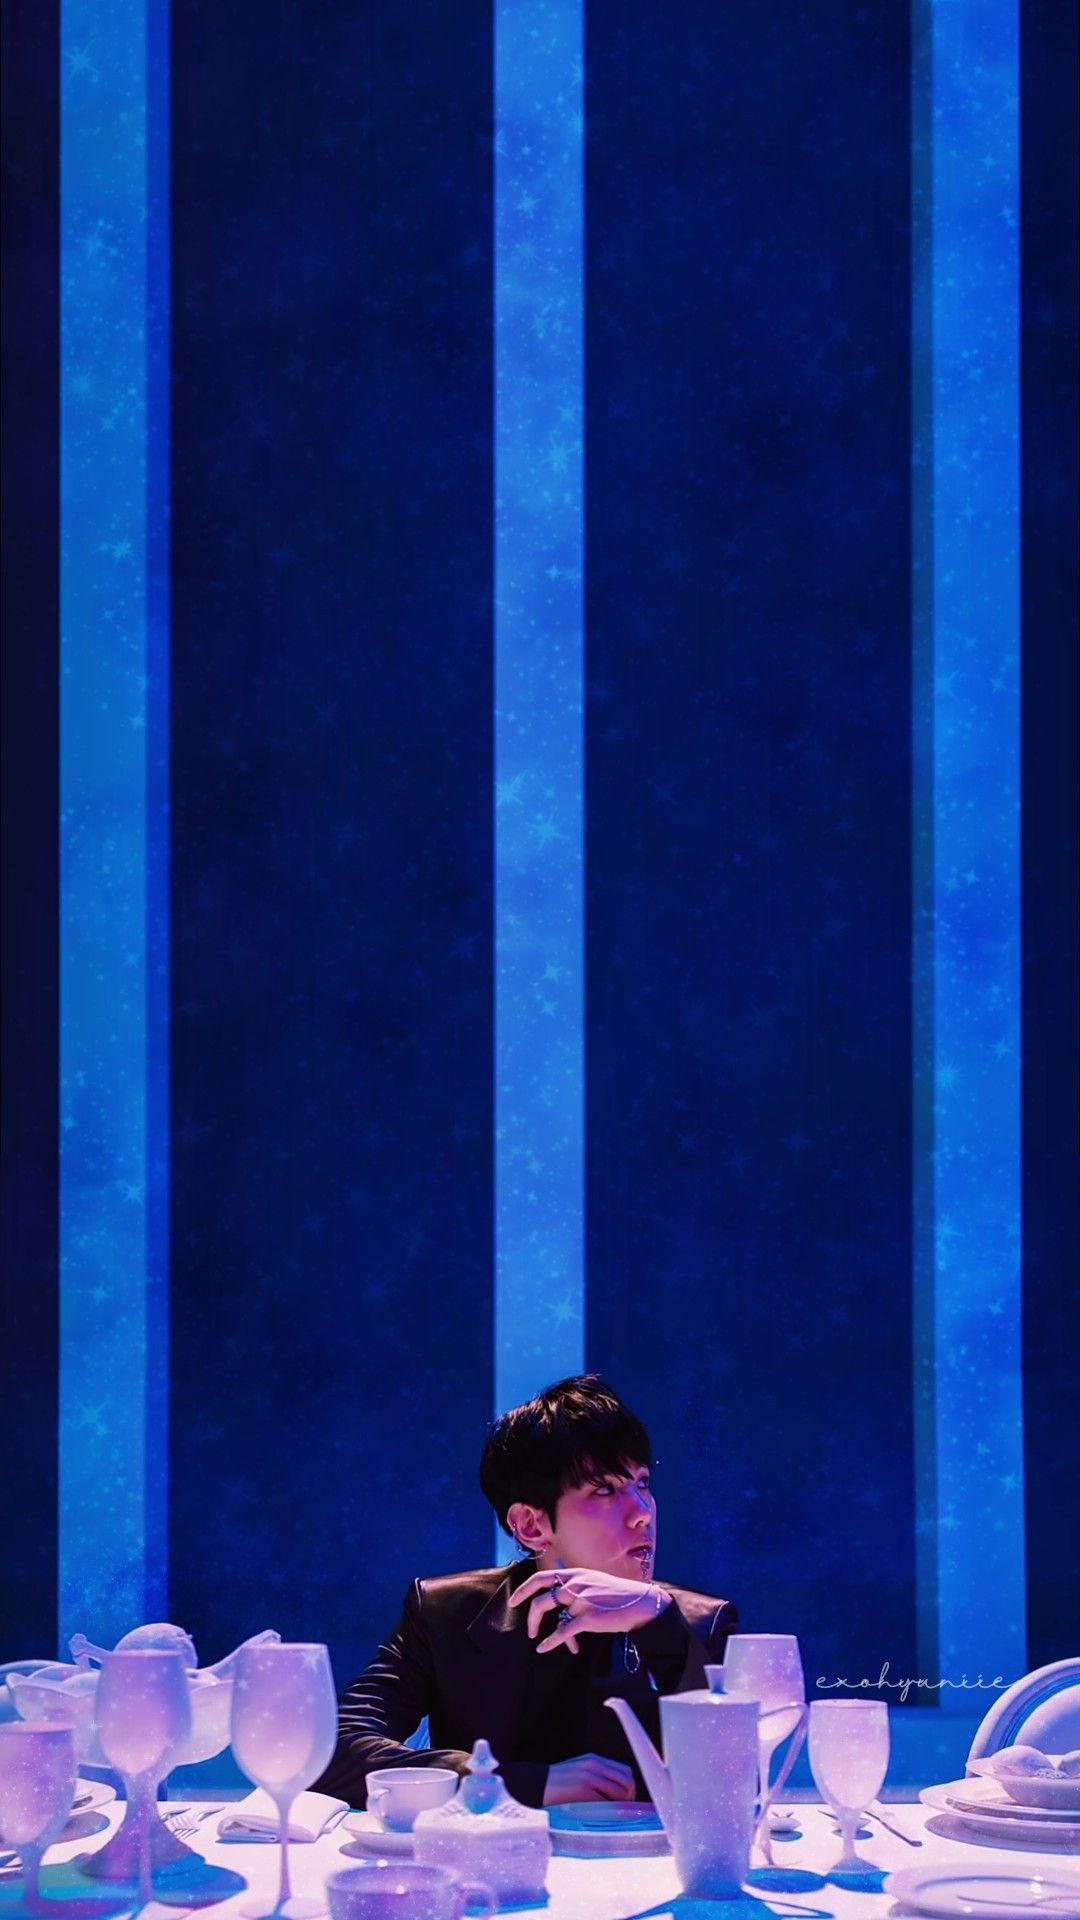 Exo Baekhyun Lockscreen Wallpaper Exo Baekhyun Wallpaper